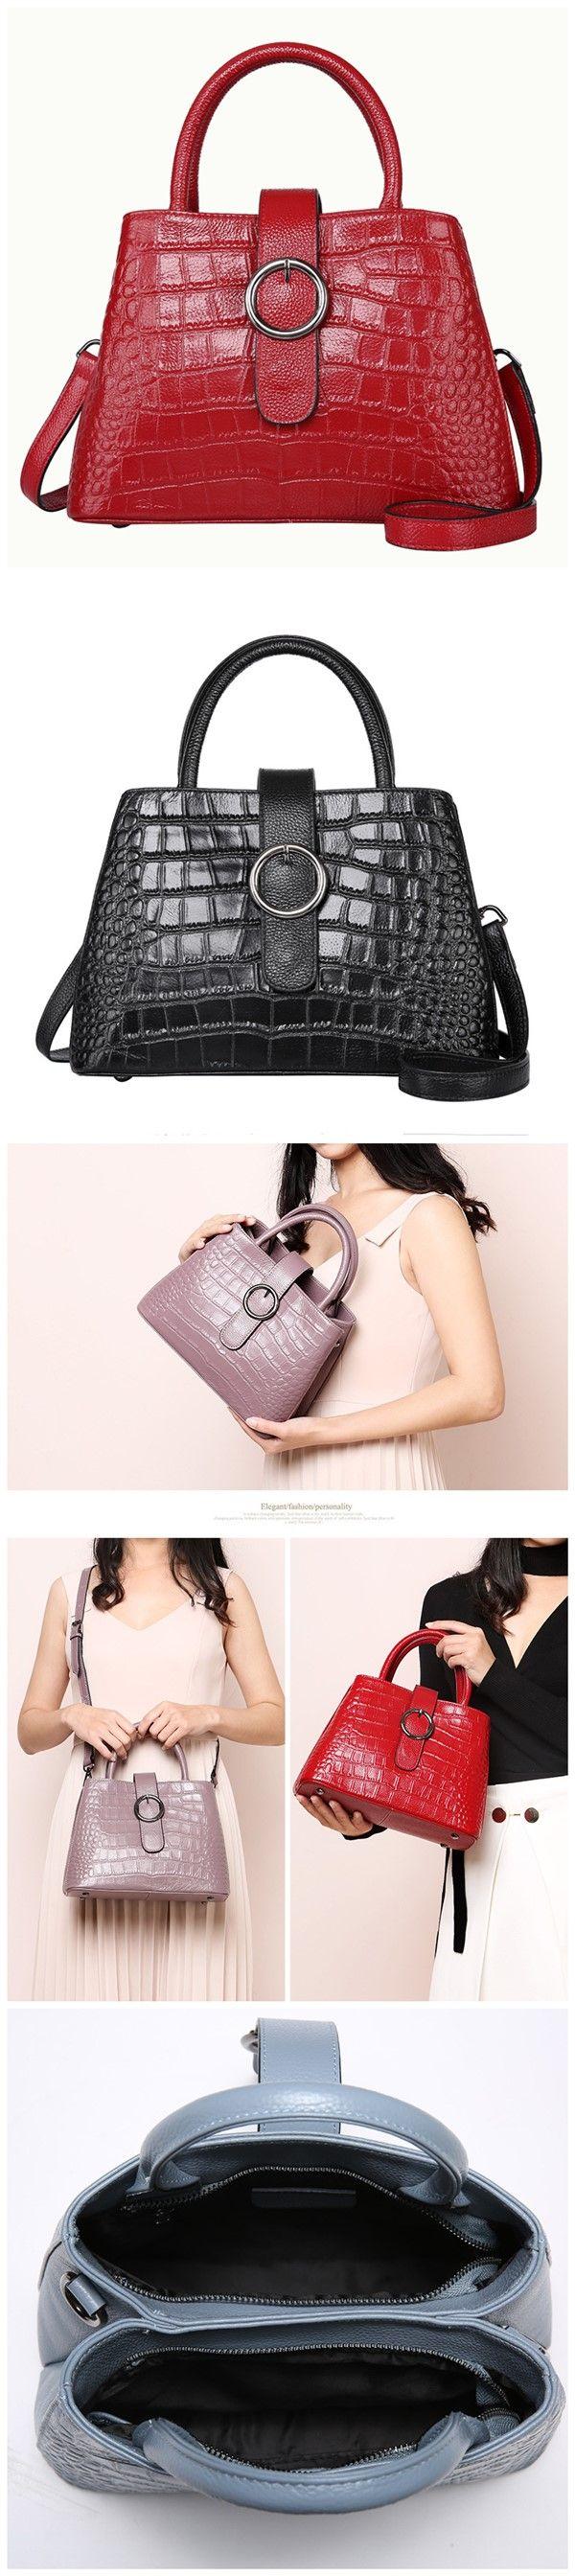 Classy Women's Top-handle Cross Body Handbag Purse Leather Tote Bag Double Pockets Bagail.com